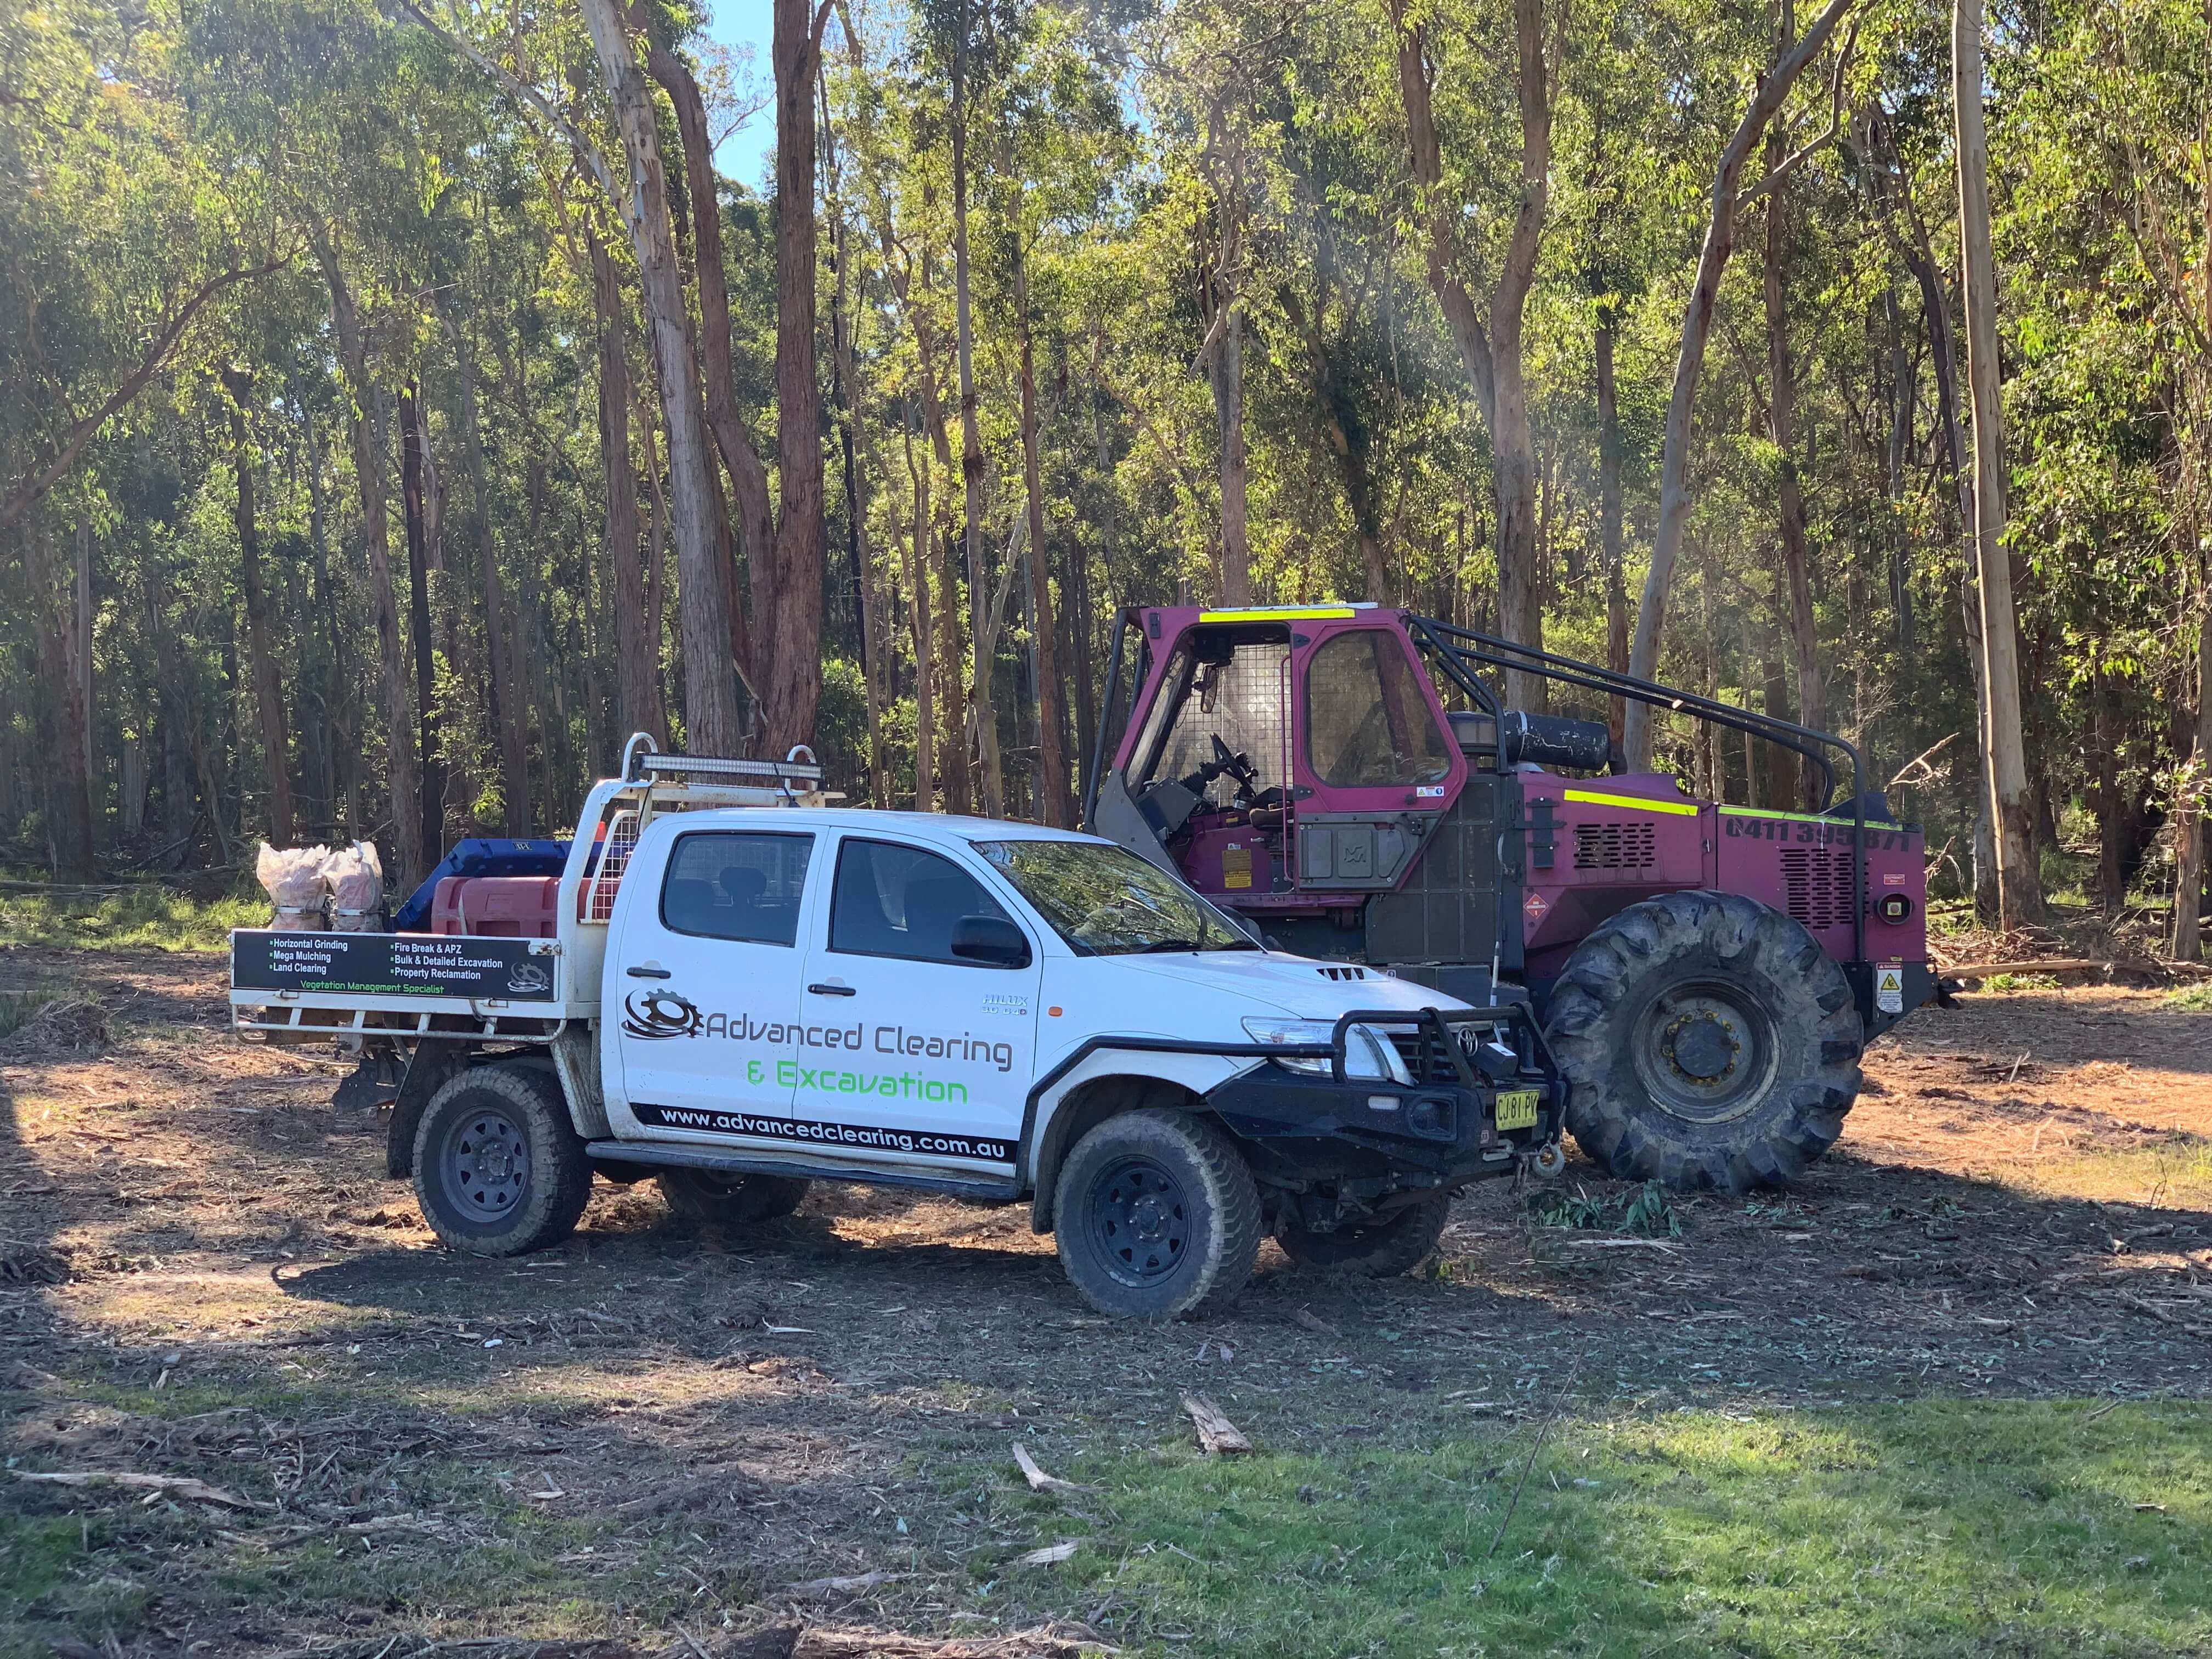 Advanced-Clearing-Excavation-bobcat-ute-Sydney